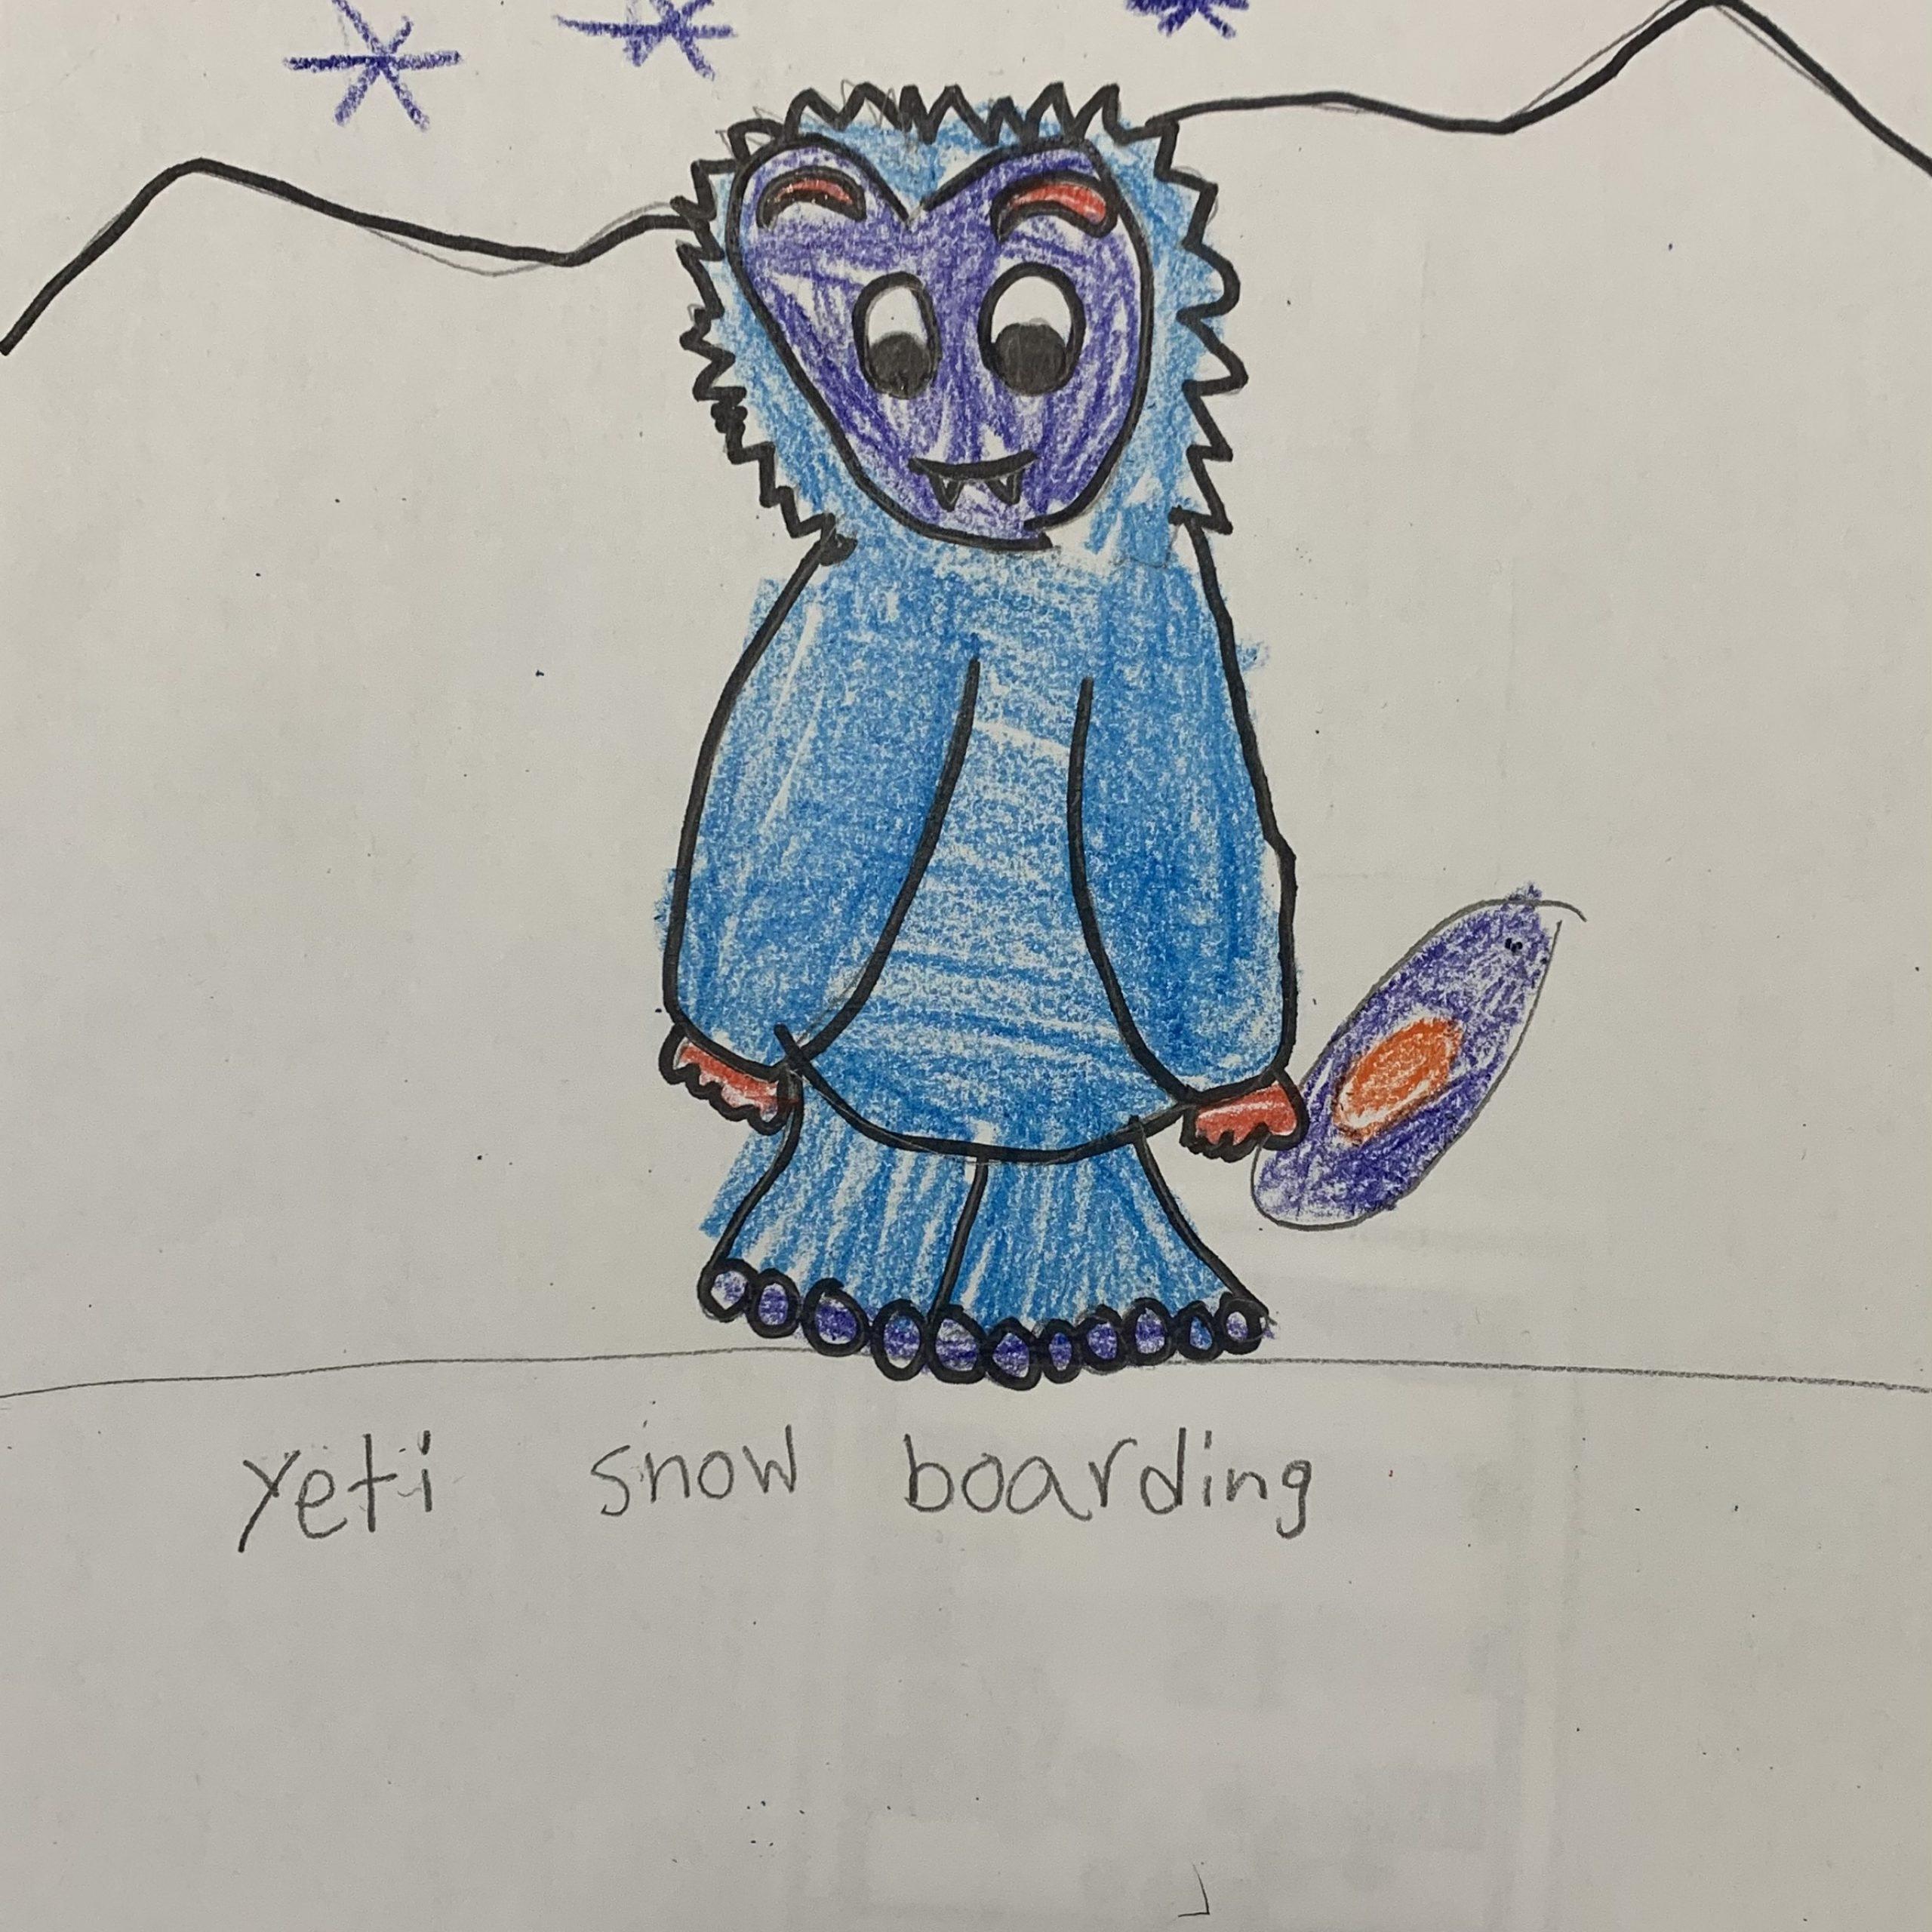 yeti snowboarding harper 2nd l